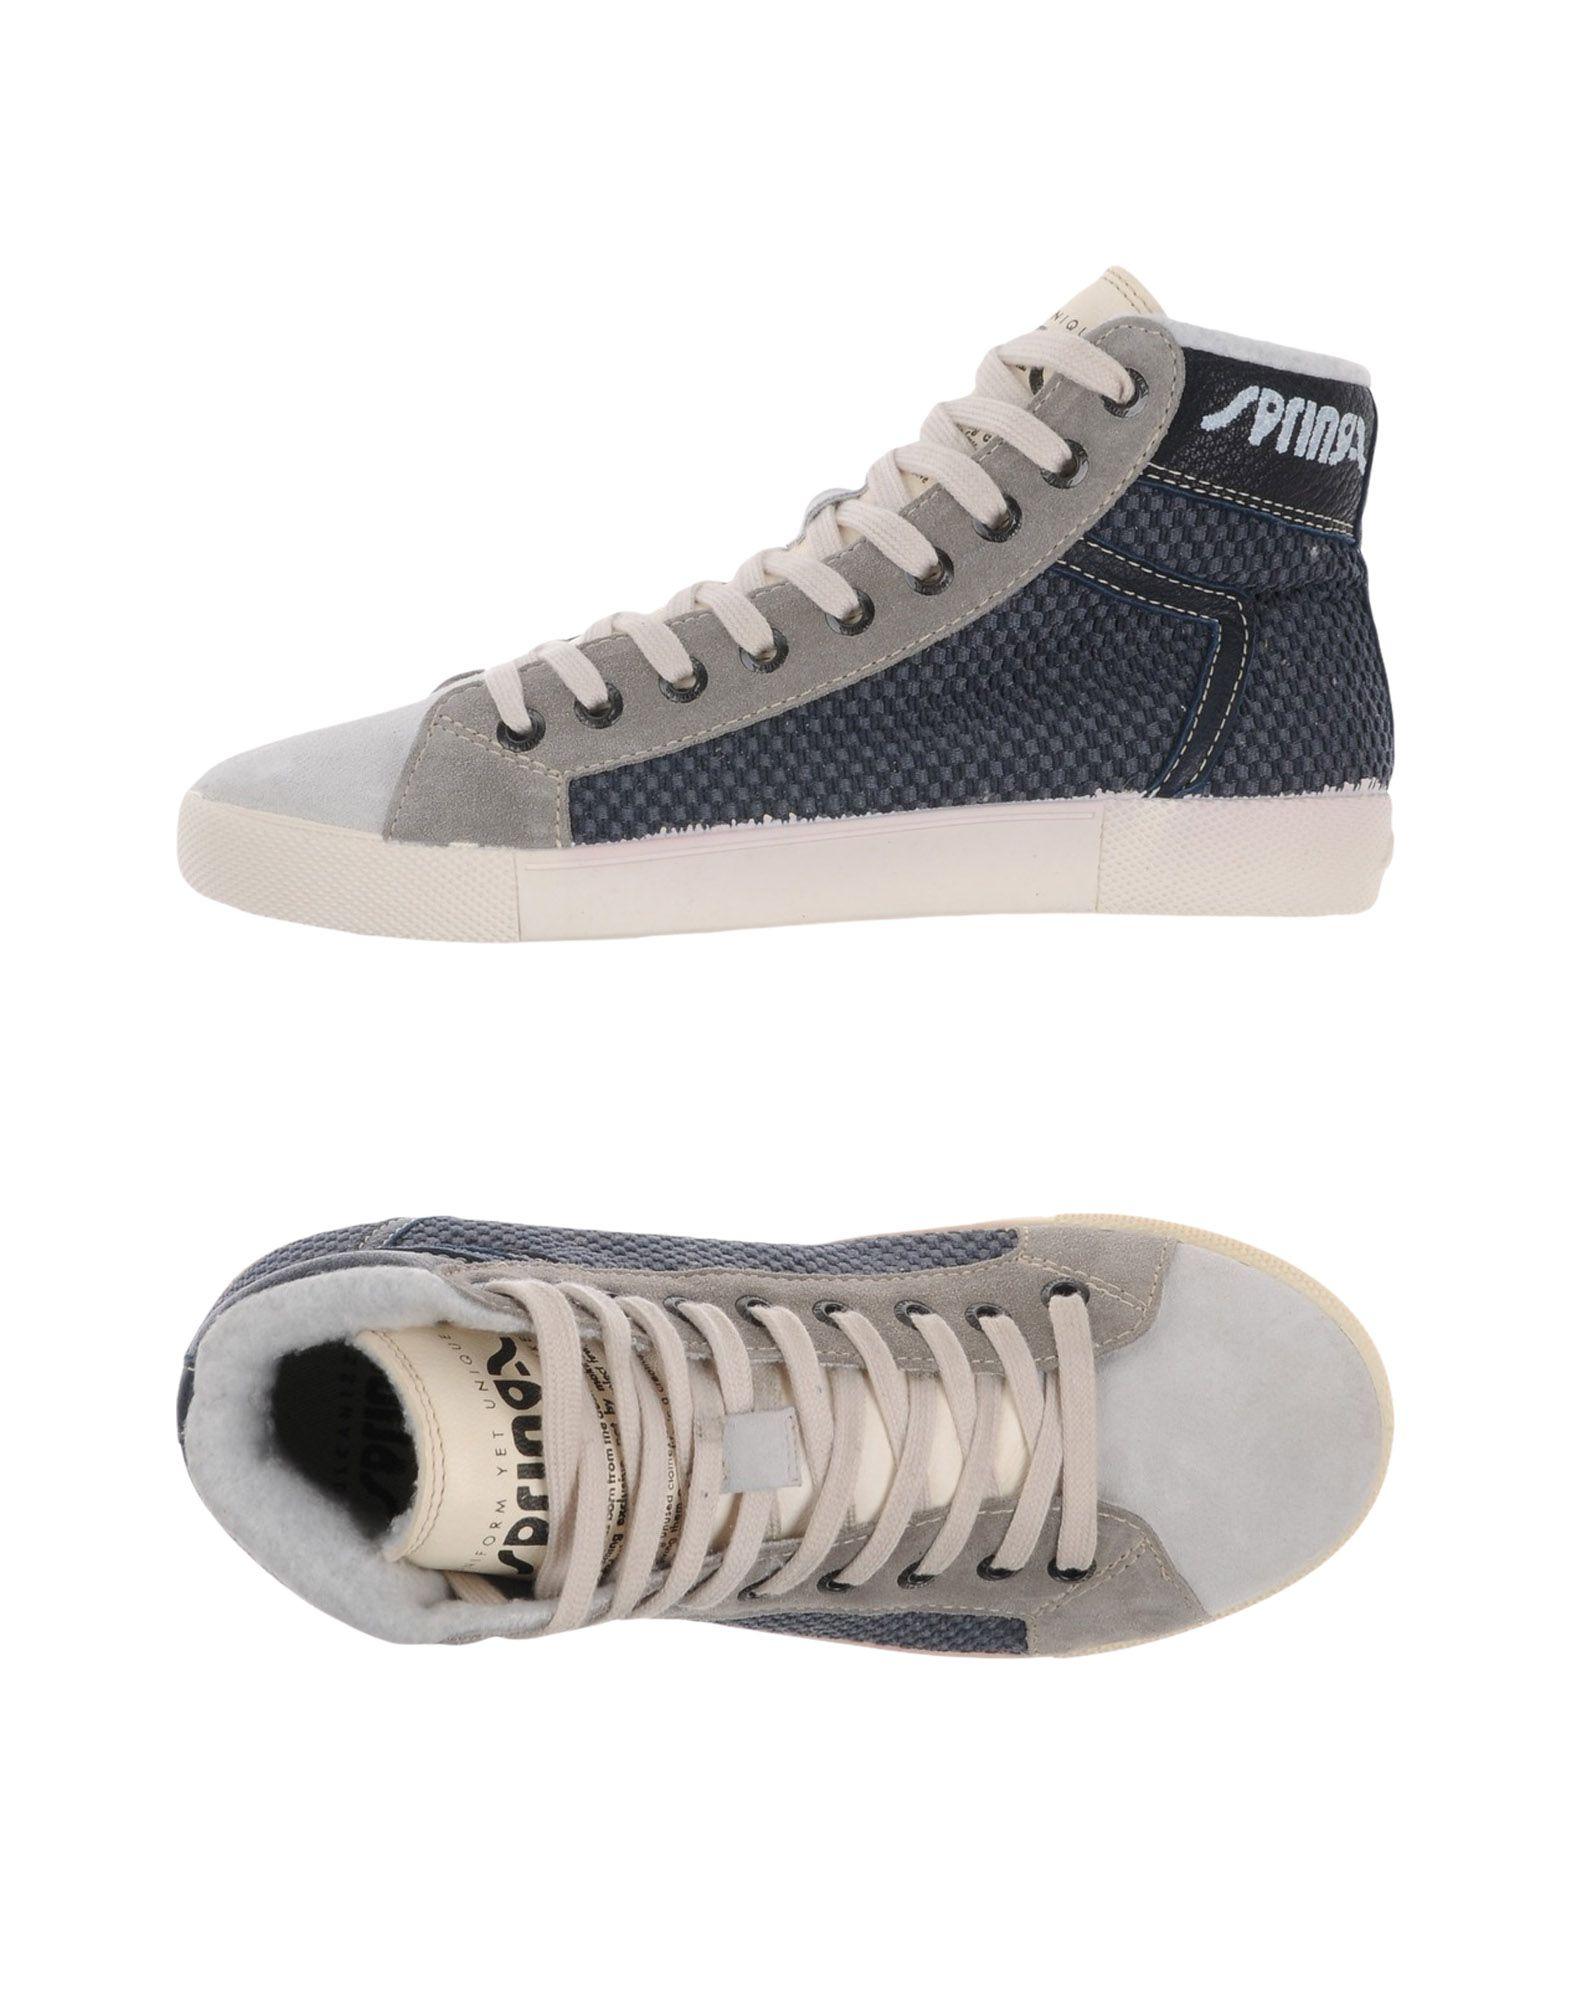 Rabatt echte Schuhe Herren Springa Sneakers Herren Schuhe  11272319JT 0f009b